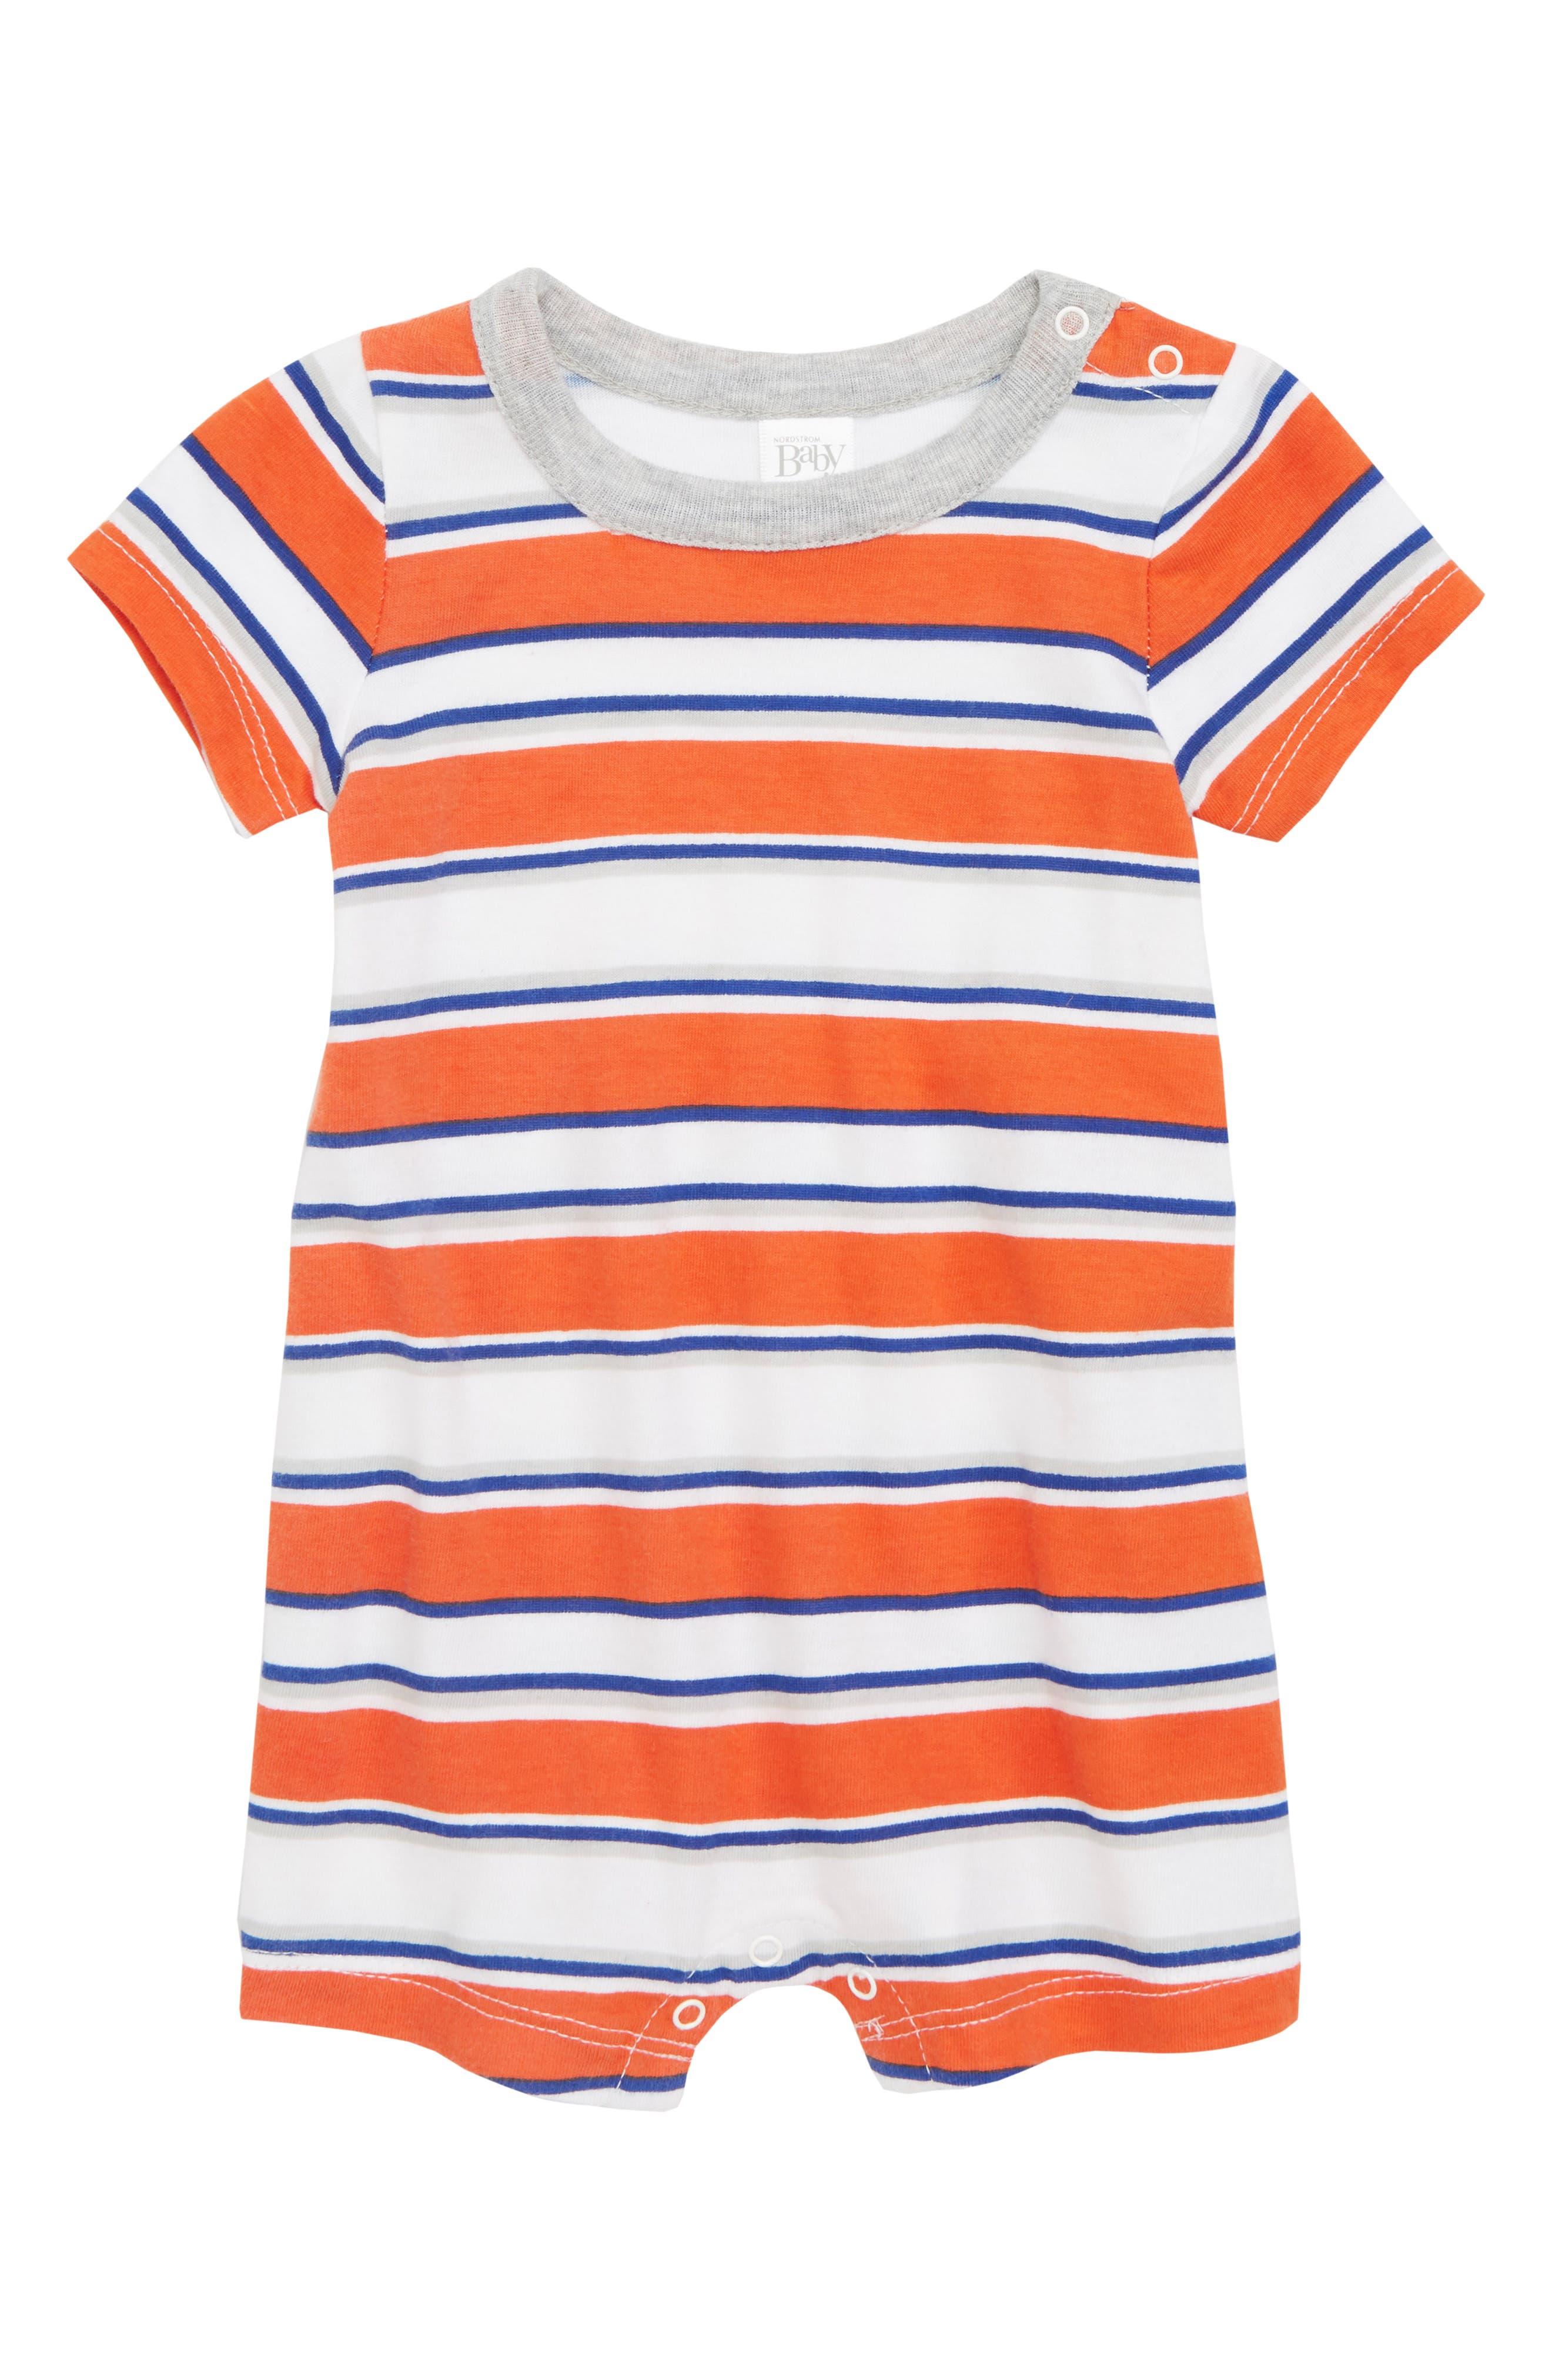 Stripe Romper,                             Main thumbnail 1, color,                             Orange Lily Sunset Stripe